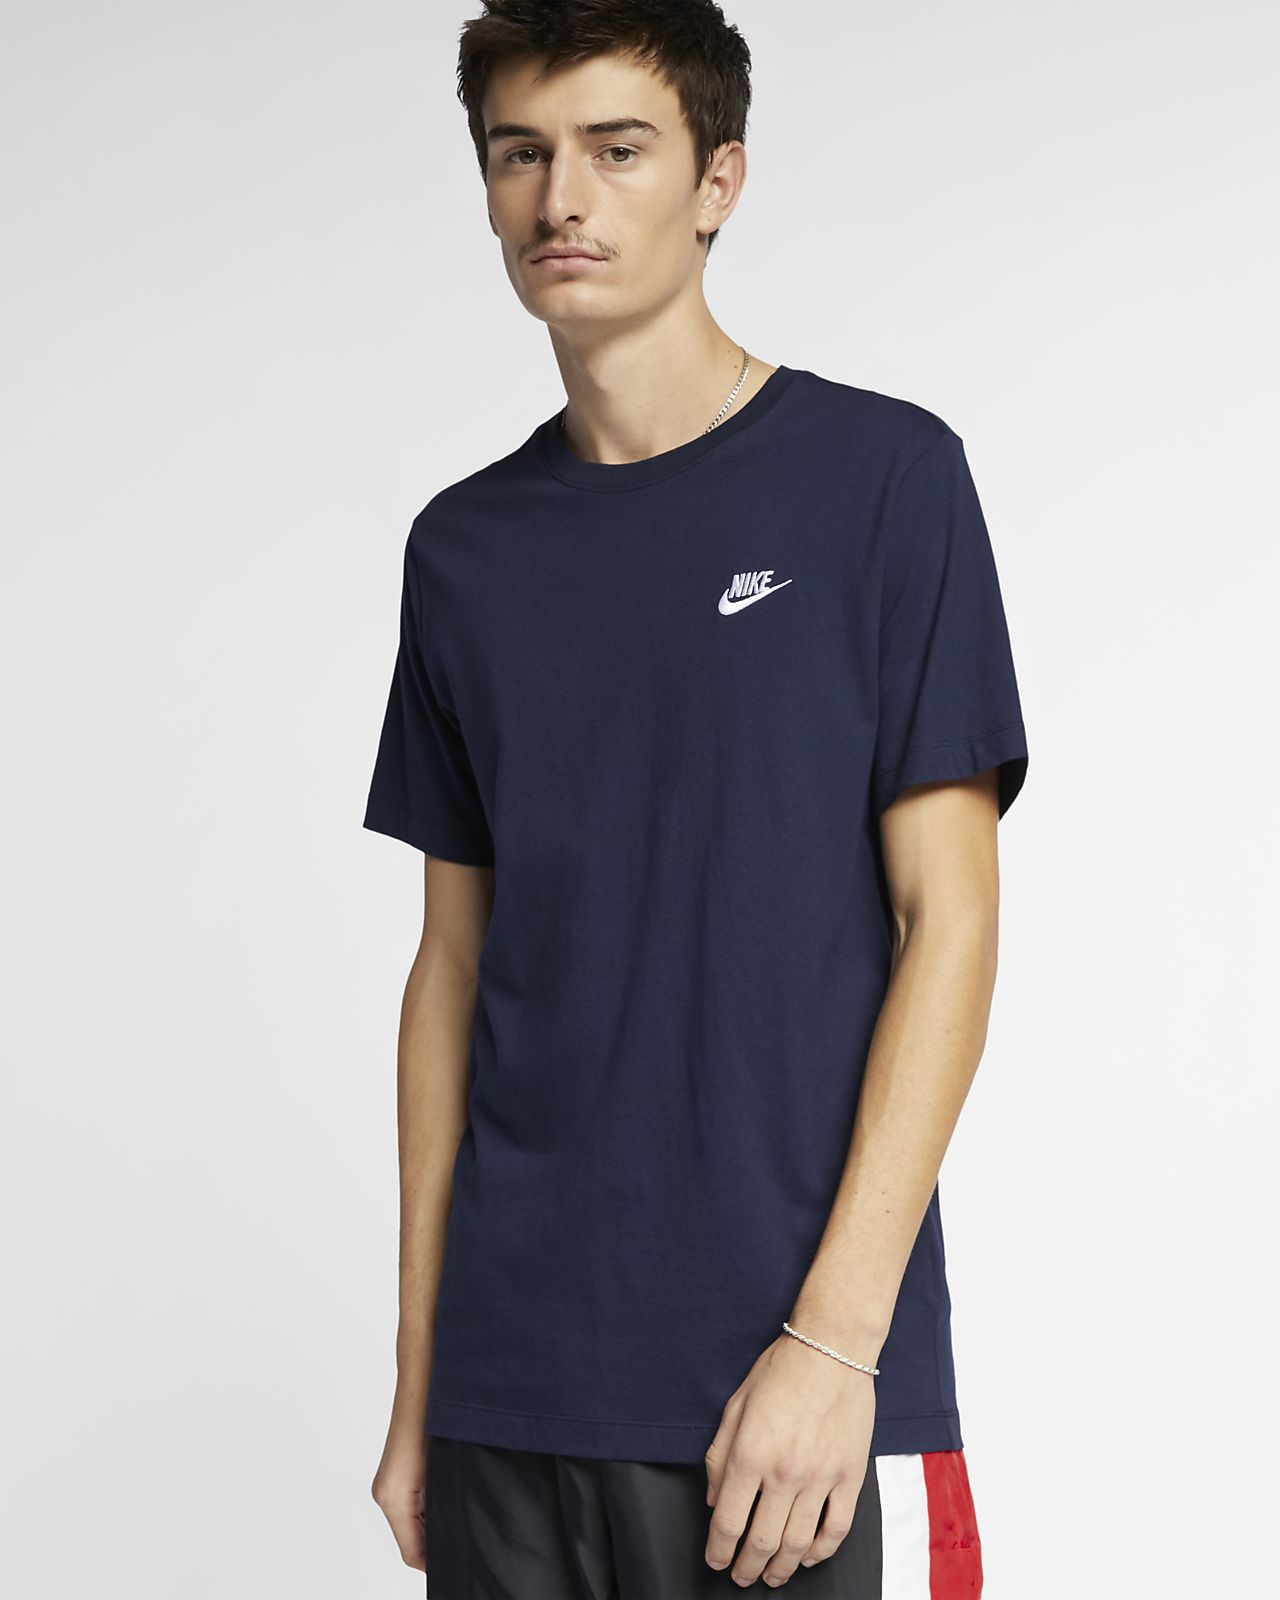 the best attitude 1dd78 9e965 ... Nike Sportswear Club Men s T-Shirt